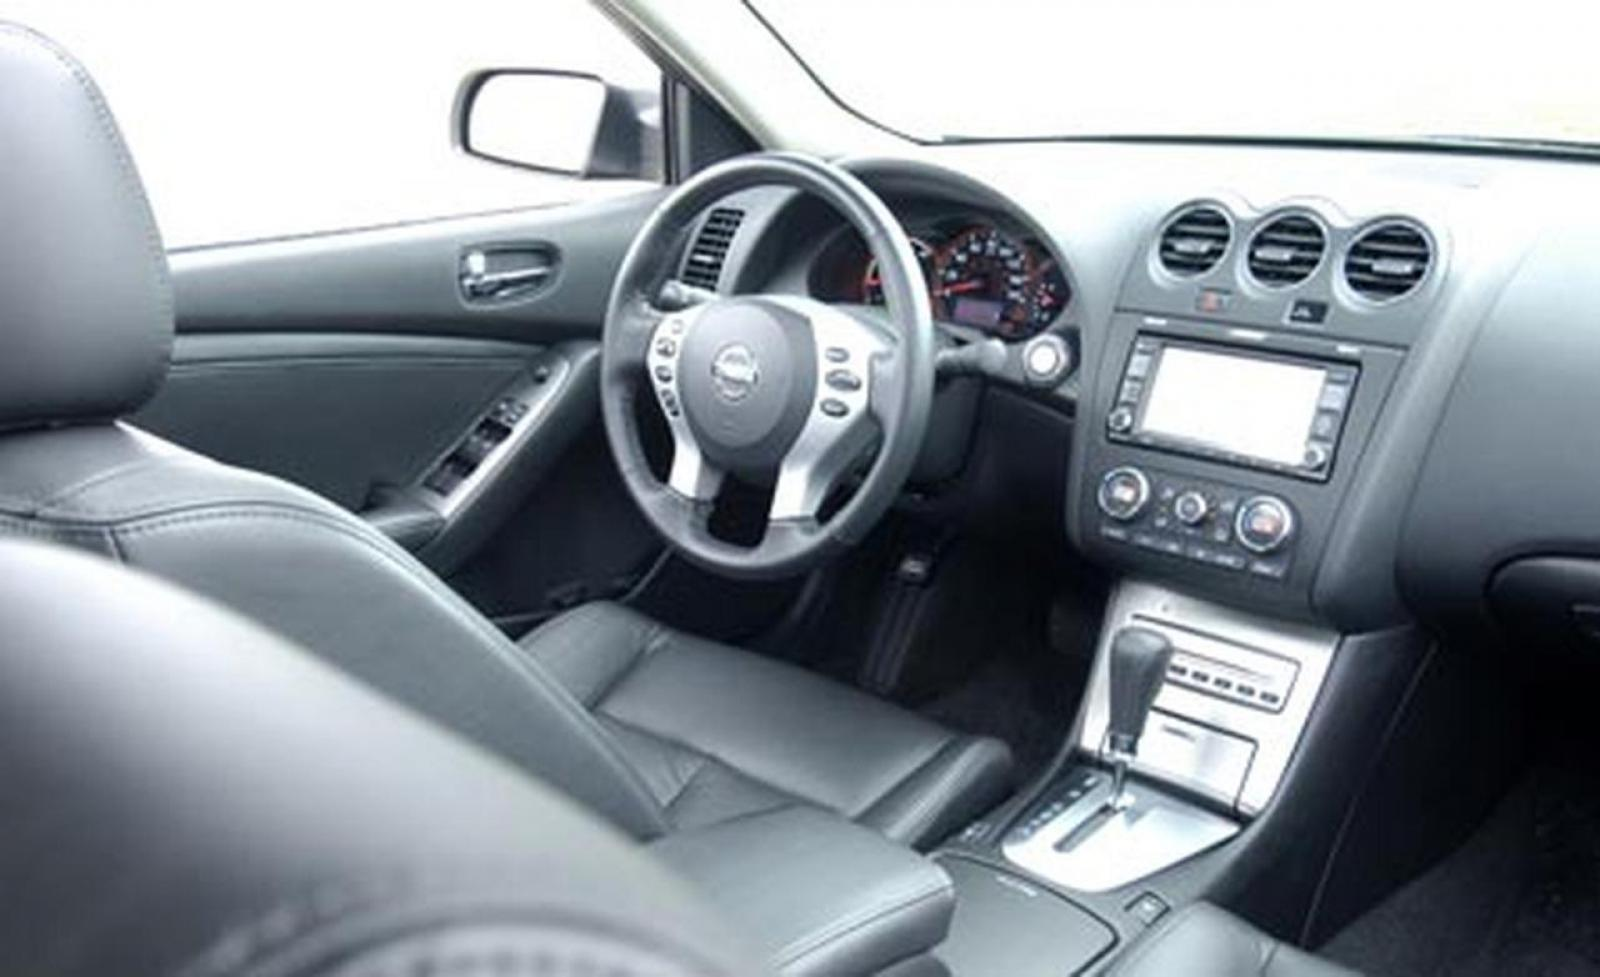 800 1024 1280 1600 Origin 2007 Nissan Altima Hybrid